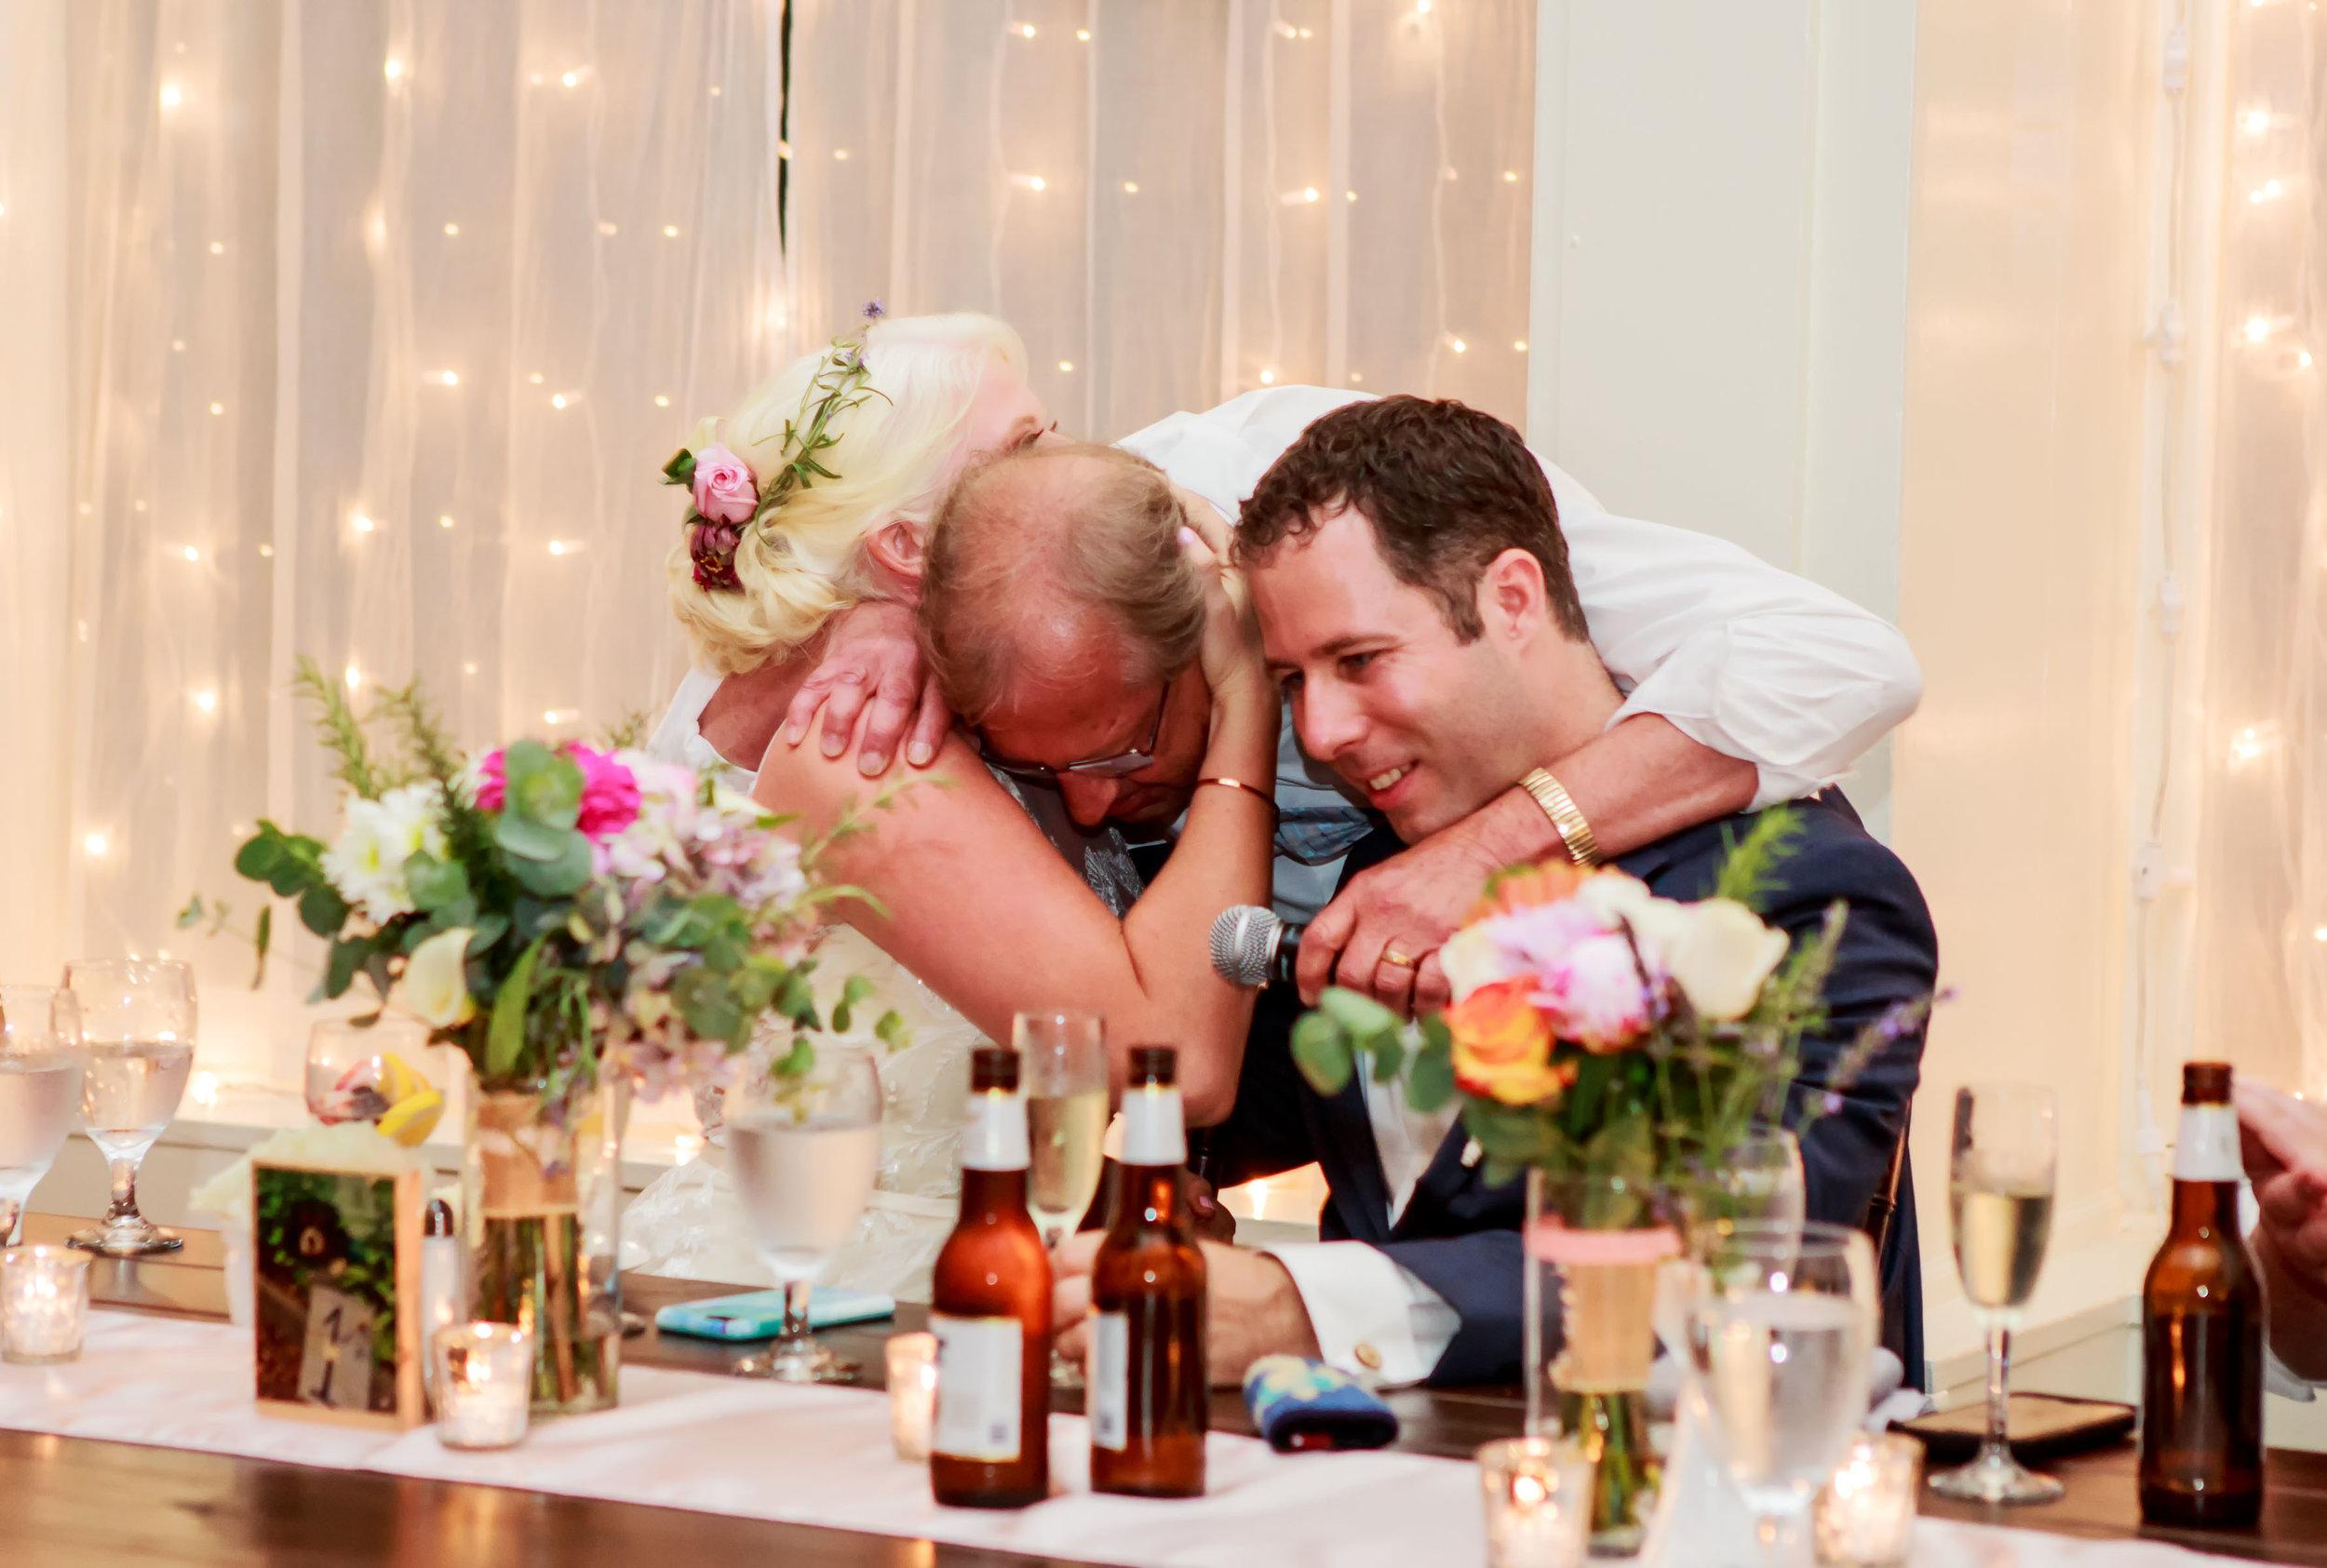 128-South-Wedding-Wilmington-NC-Photographer-Reception-112.jpg